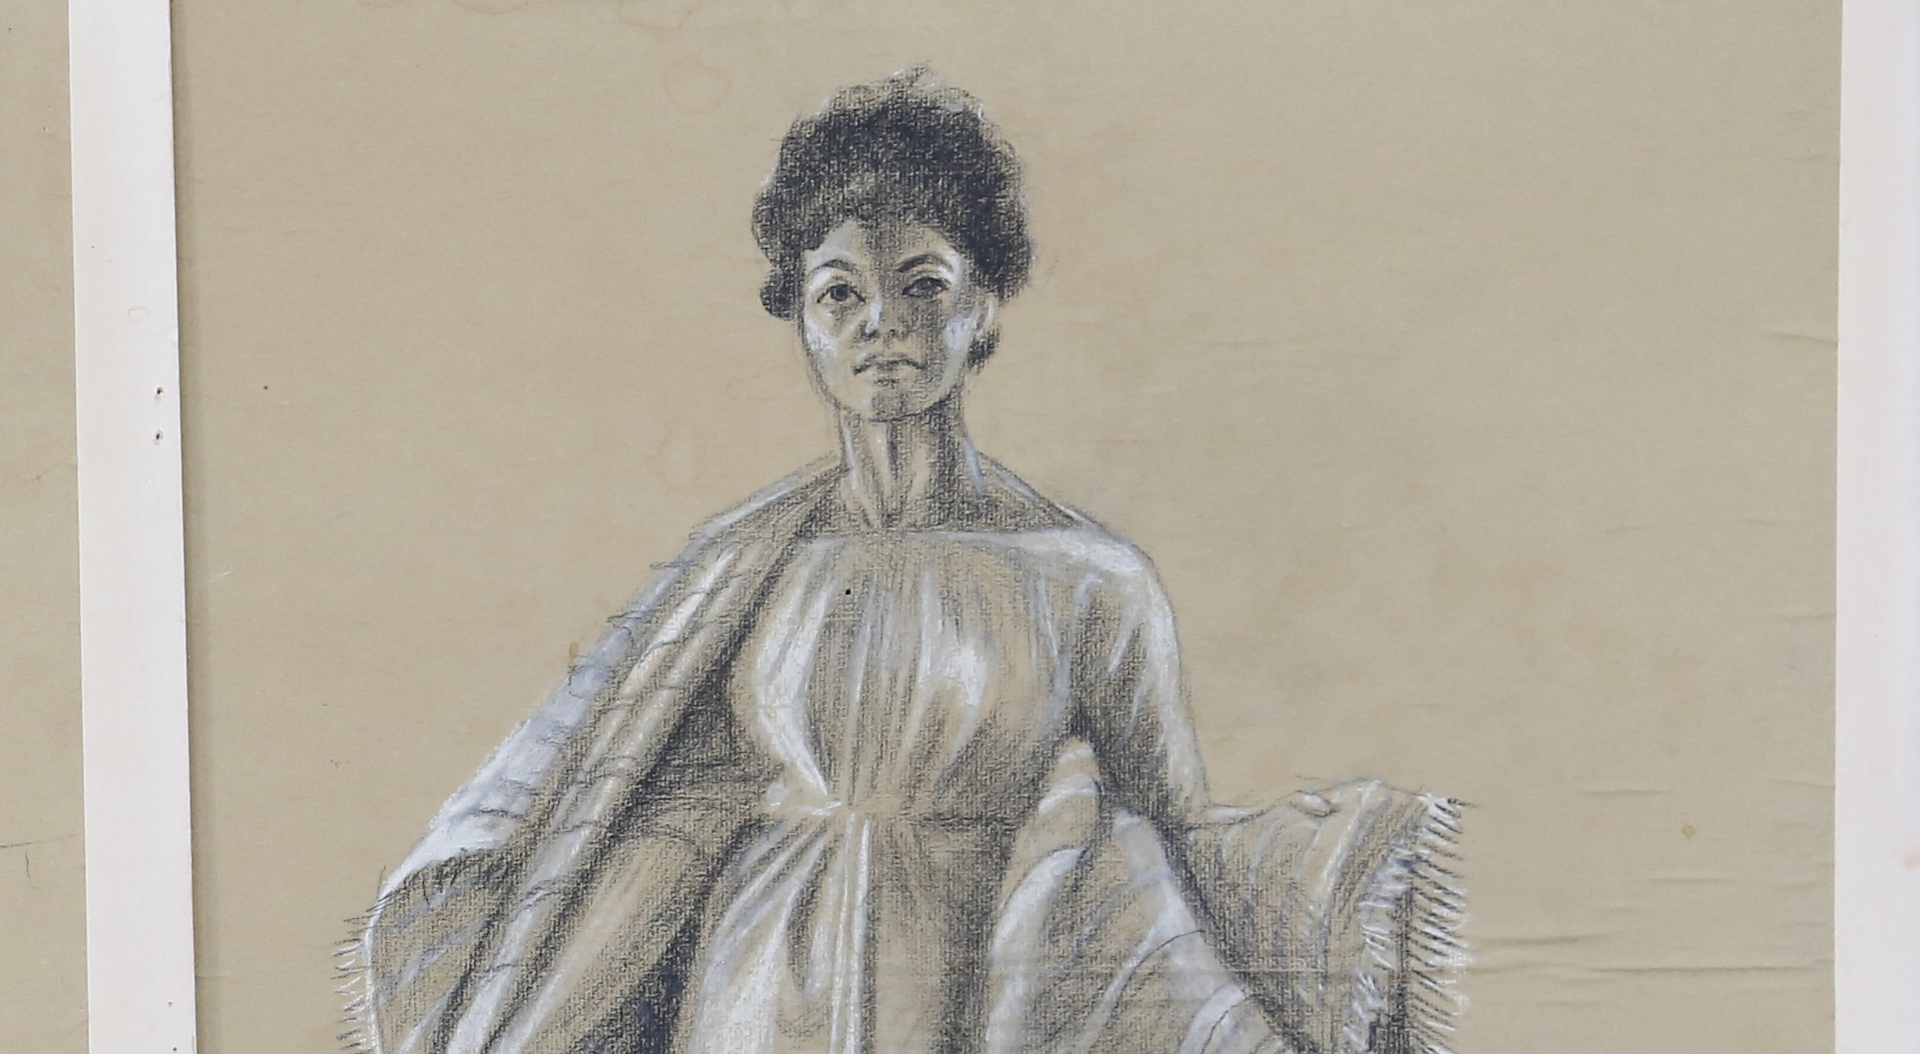 https://www-tc.pbs.org/prod-media/antiques-roadshow/article/images/ca-1960-john-biggers-drawings-crop-201306A44.JPG